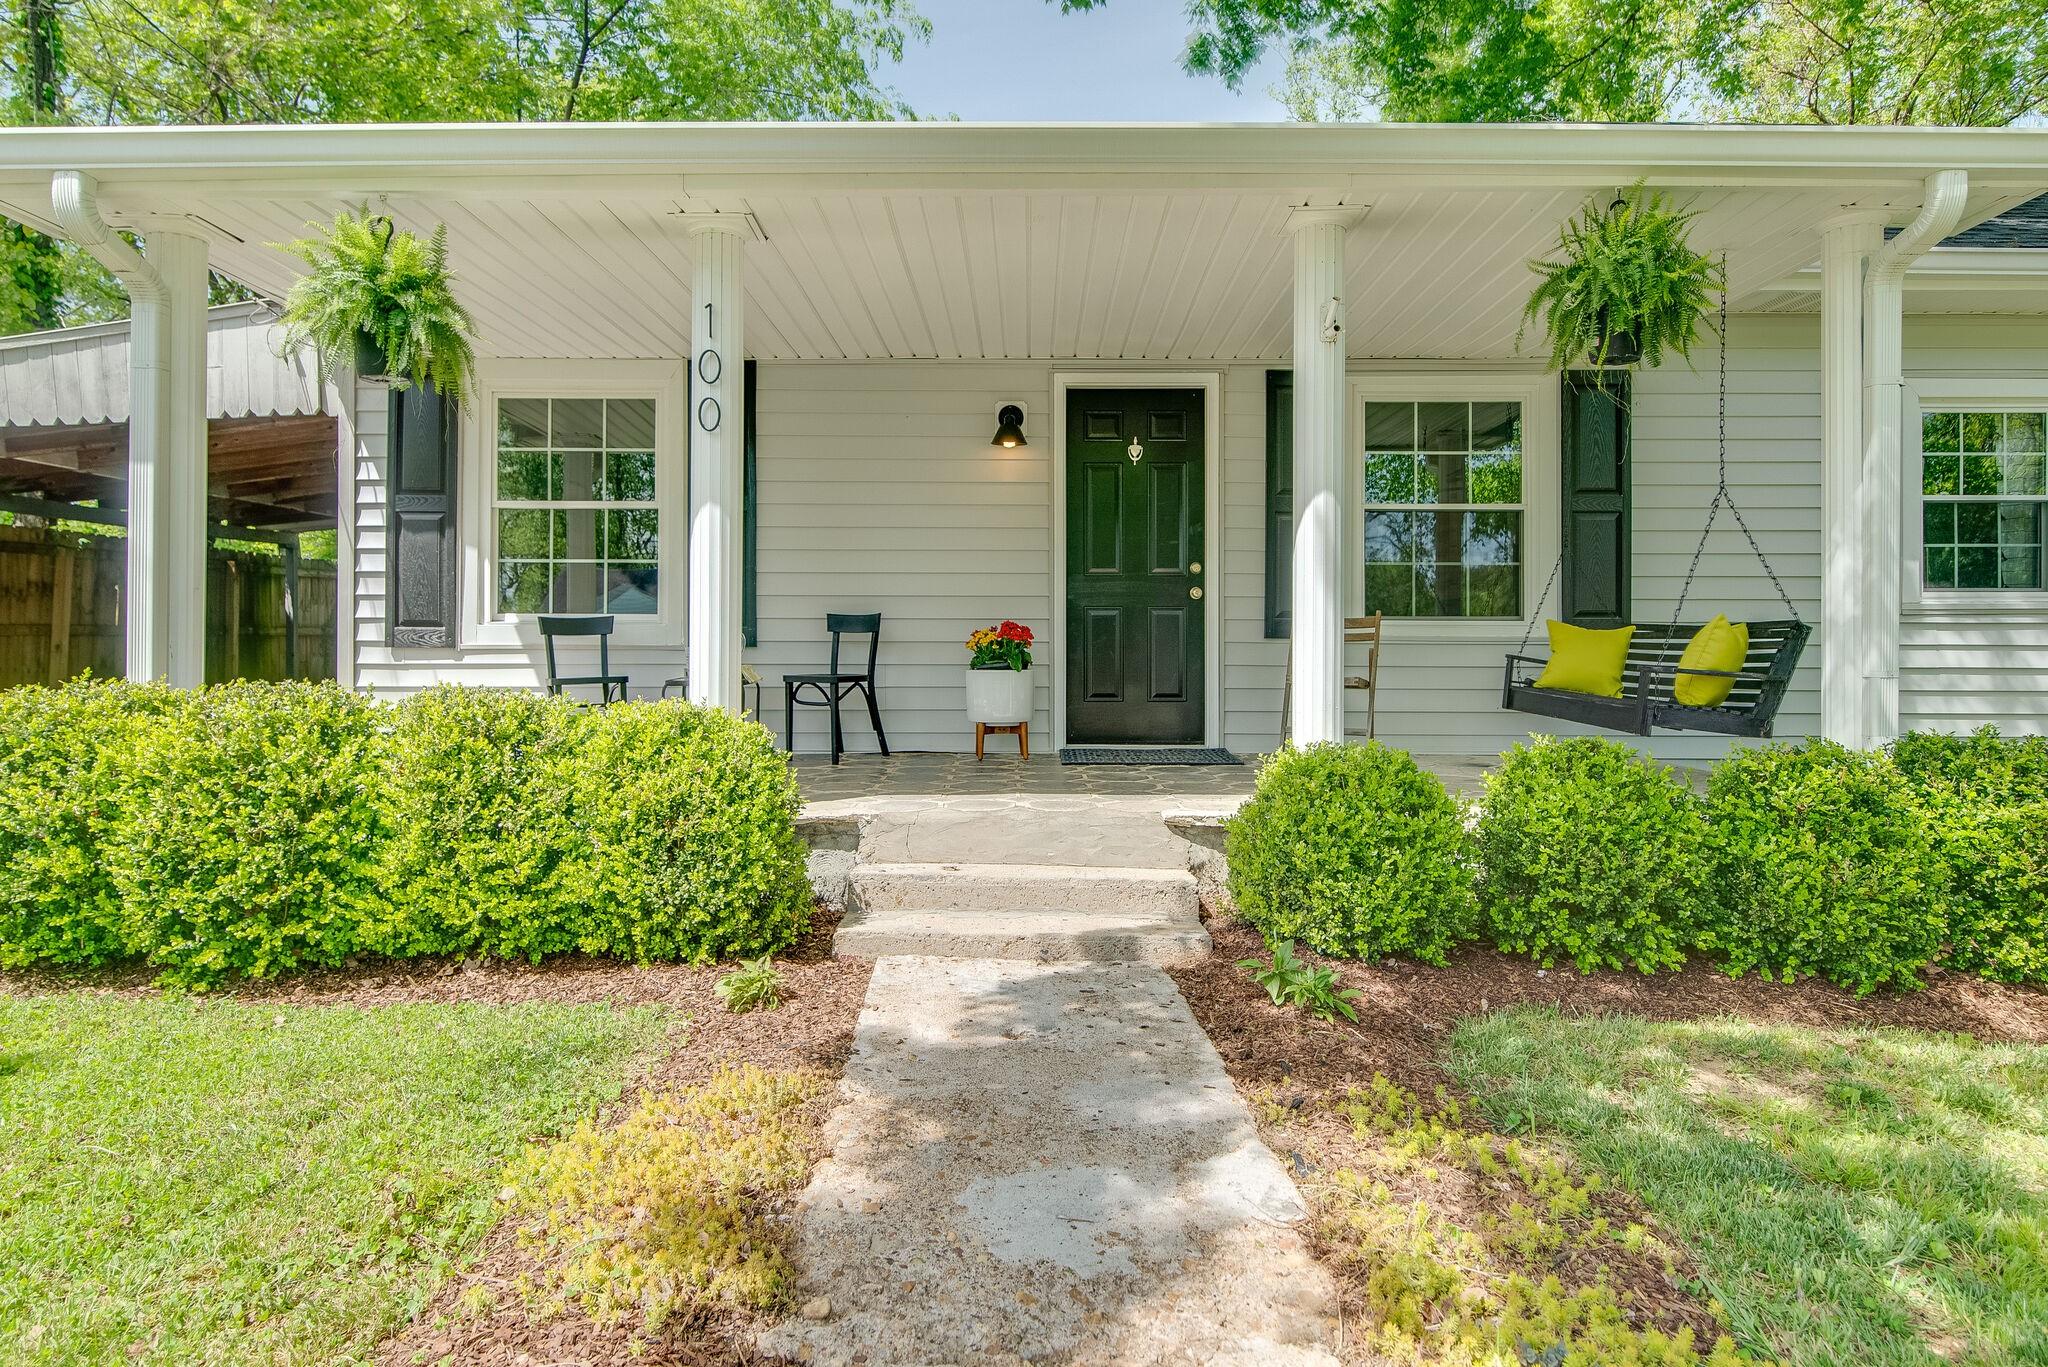 100 Elberta St Property Photo - Nashville, TN real estate listing